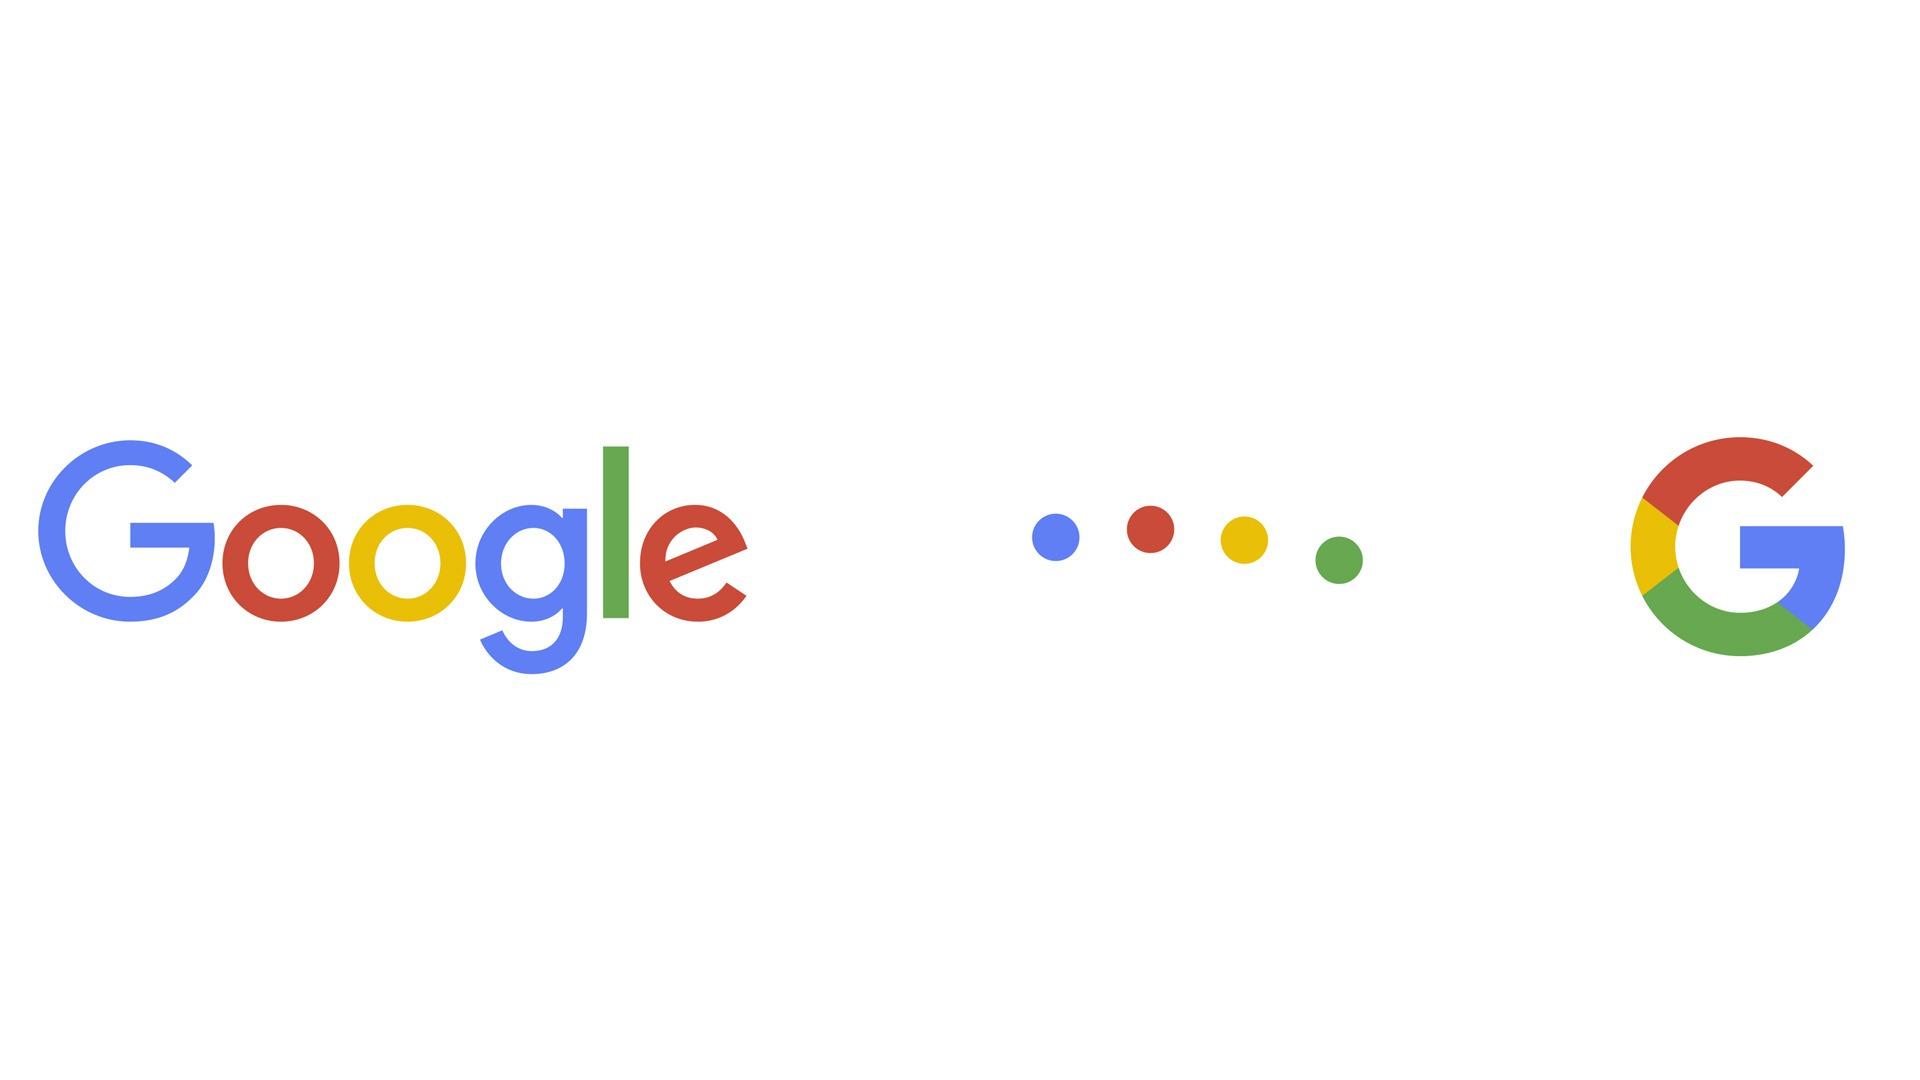 Google Backgrounds 1920x1080